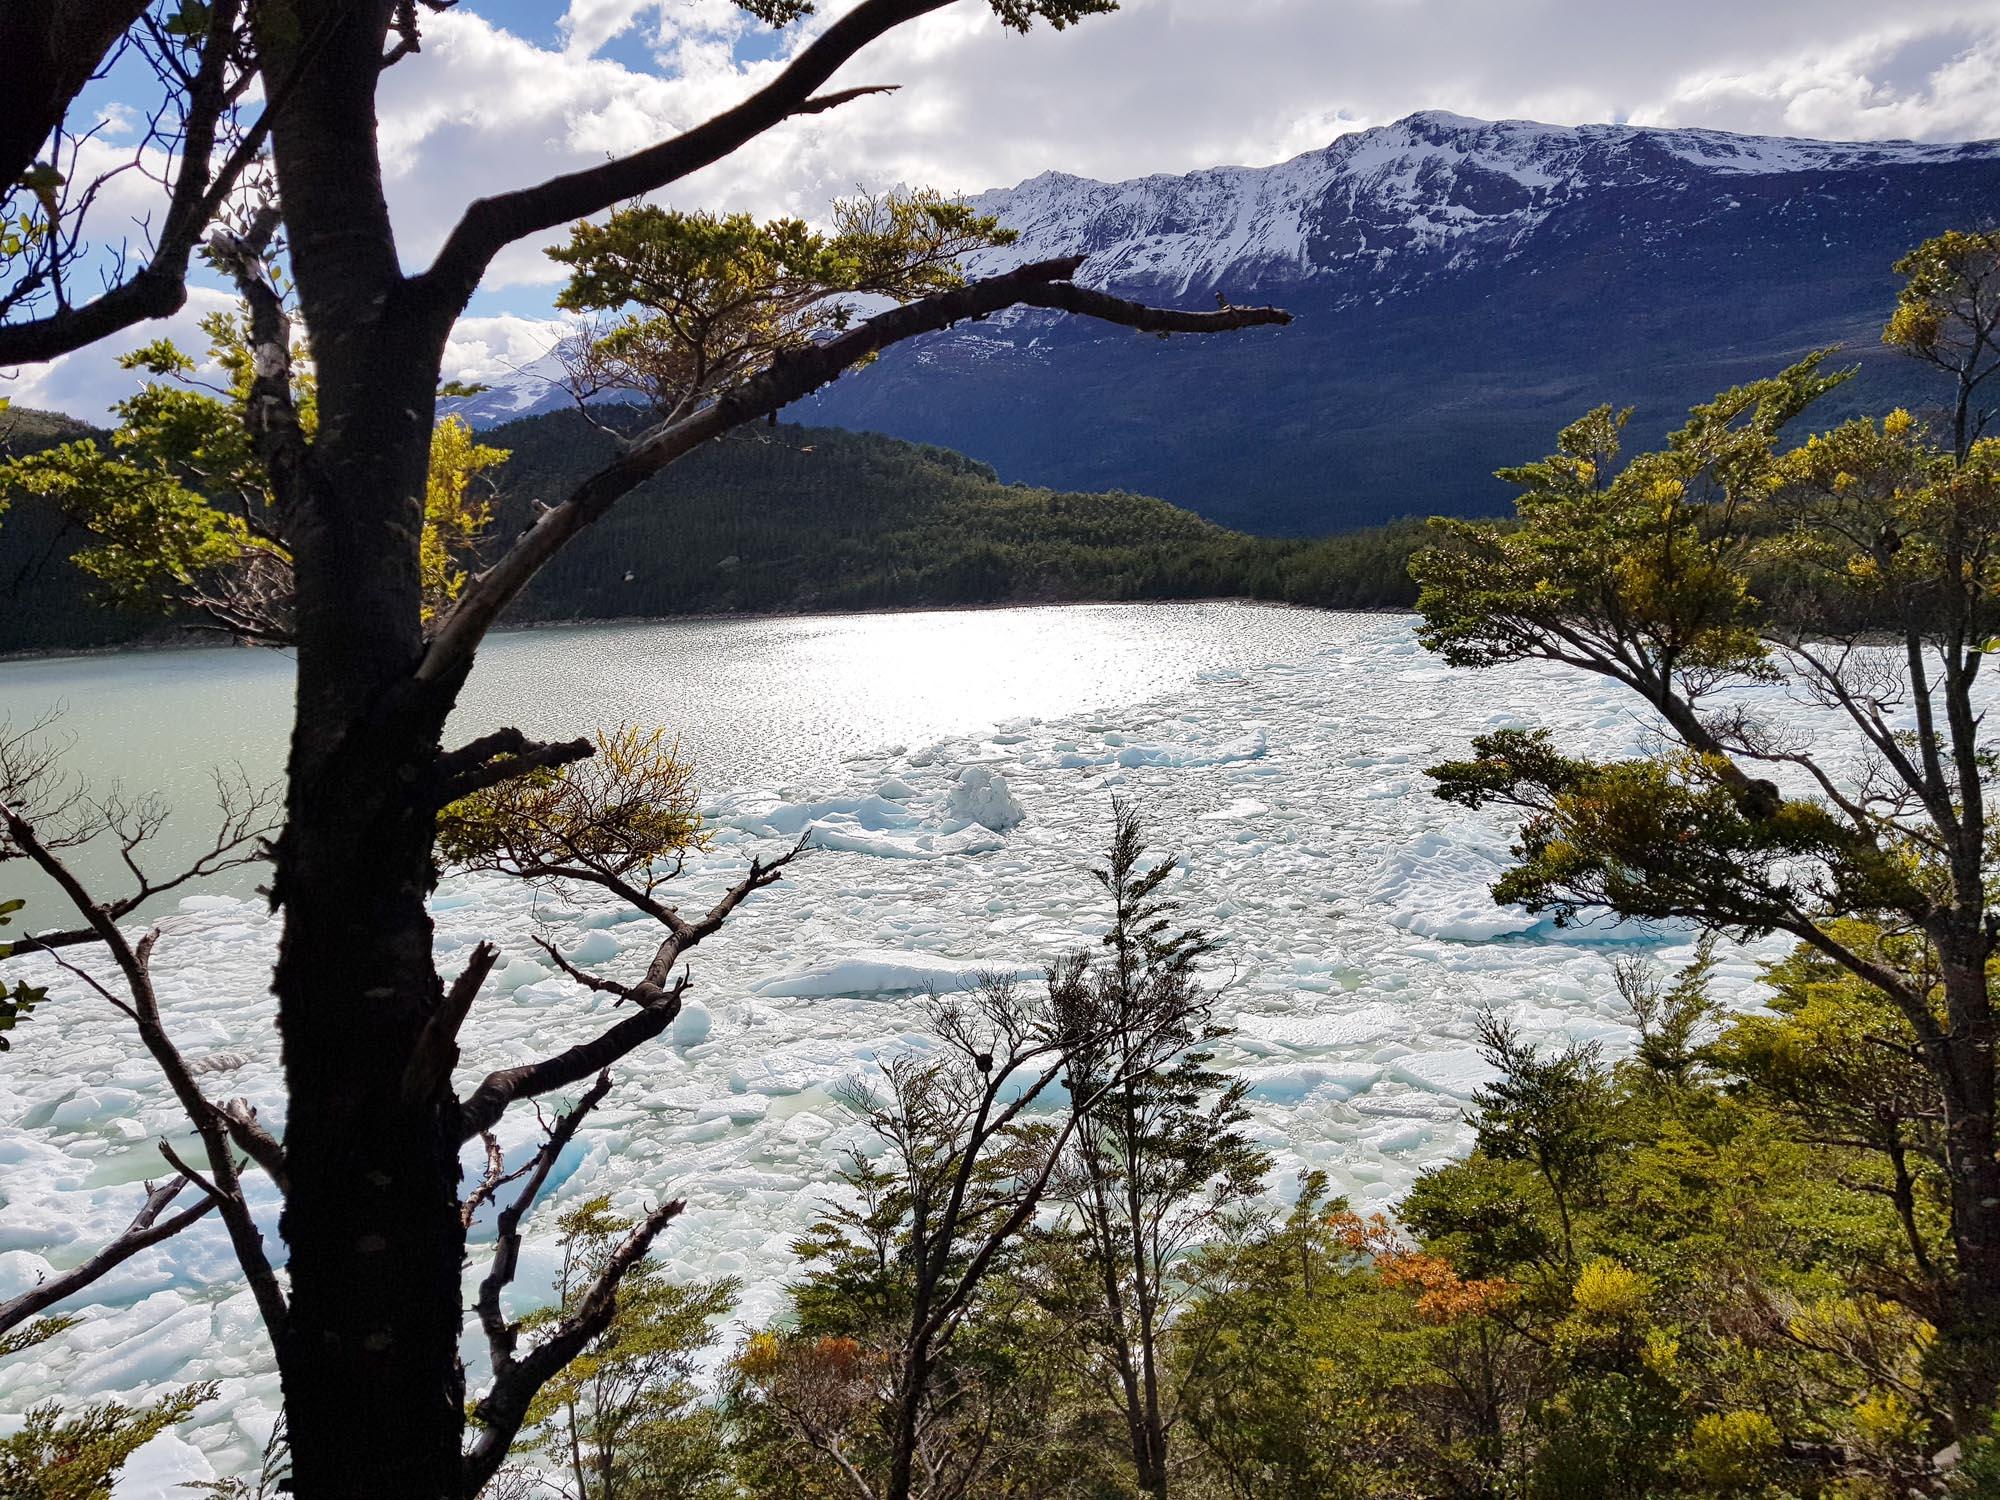 Am Fußweg zum Serrano-Gletscher